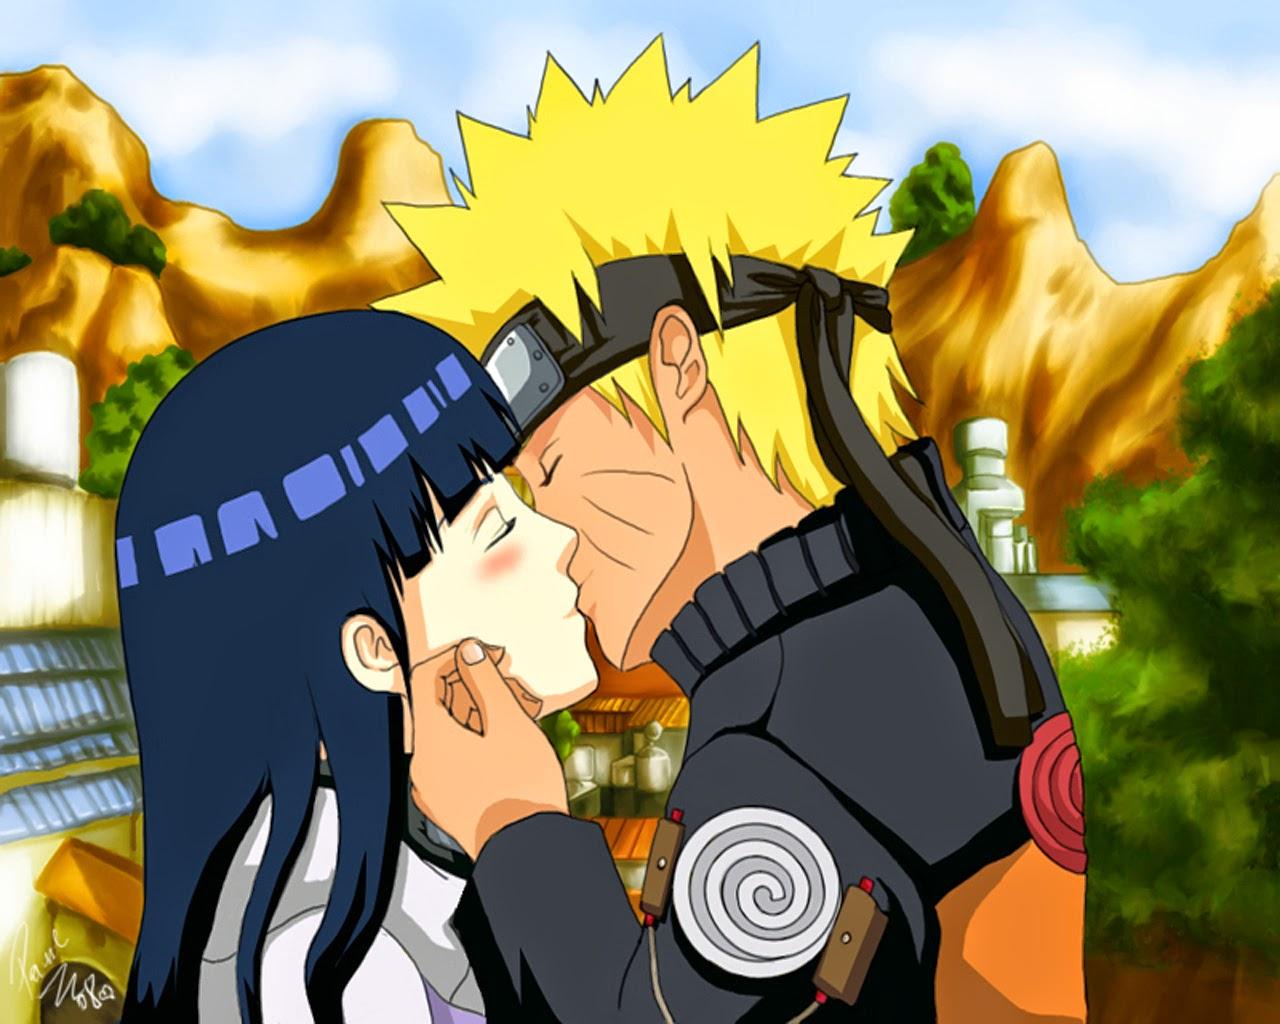 naruto sakura kissing pictures imgstar